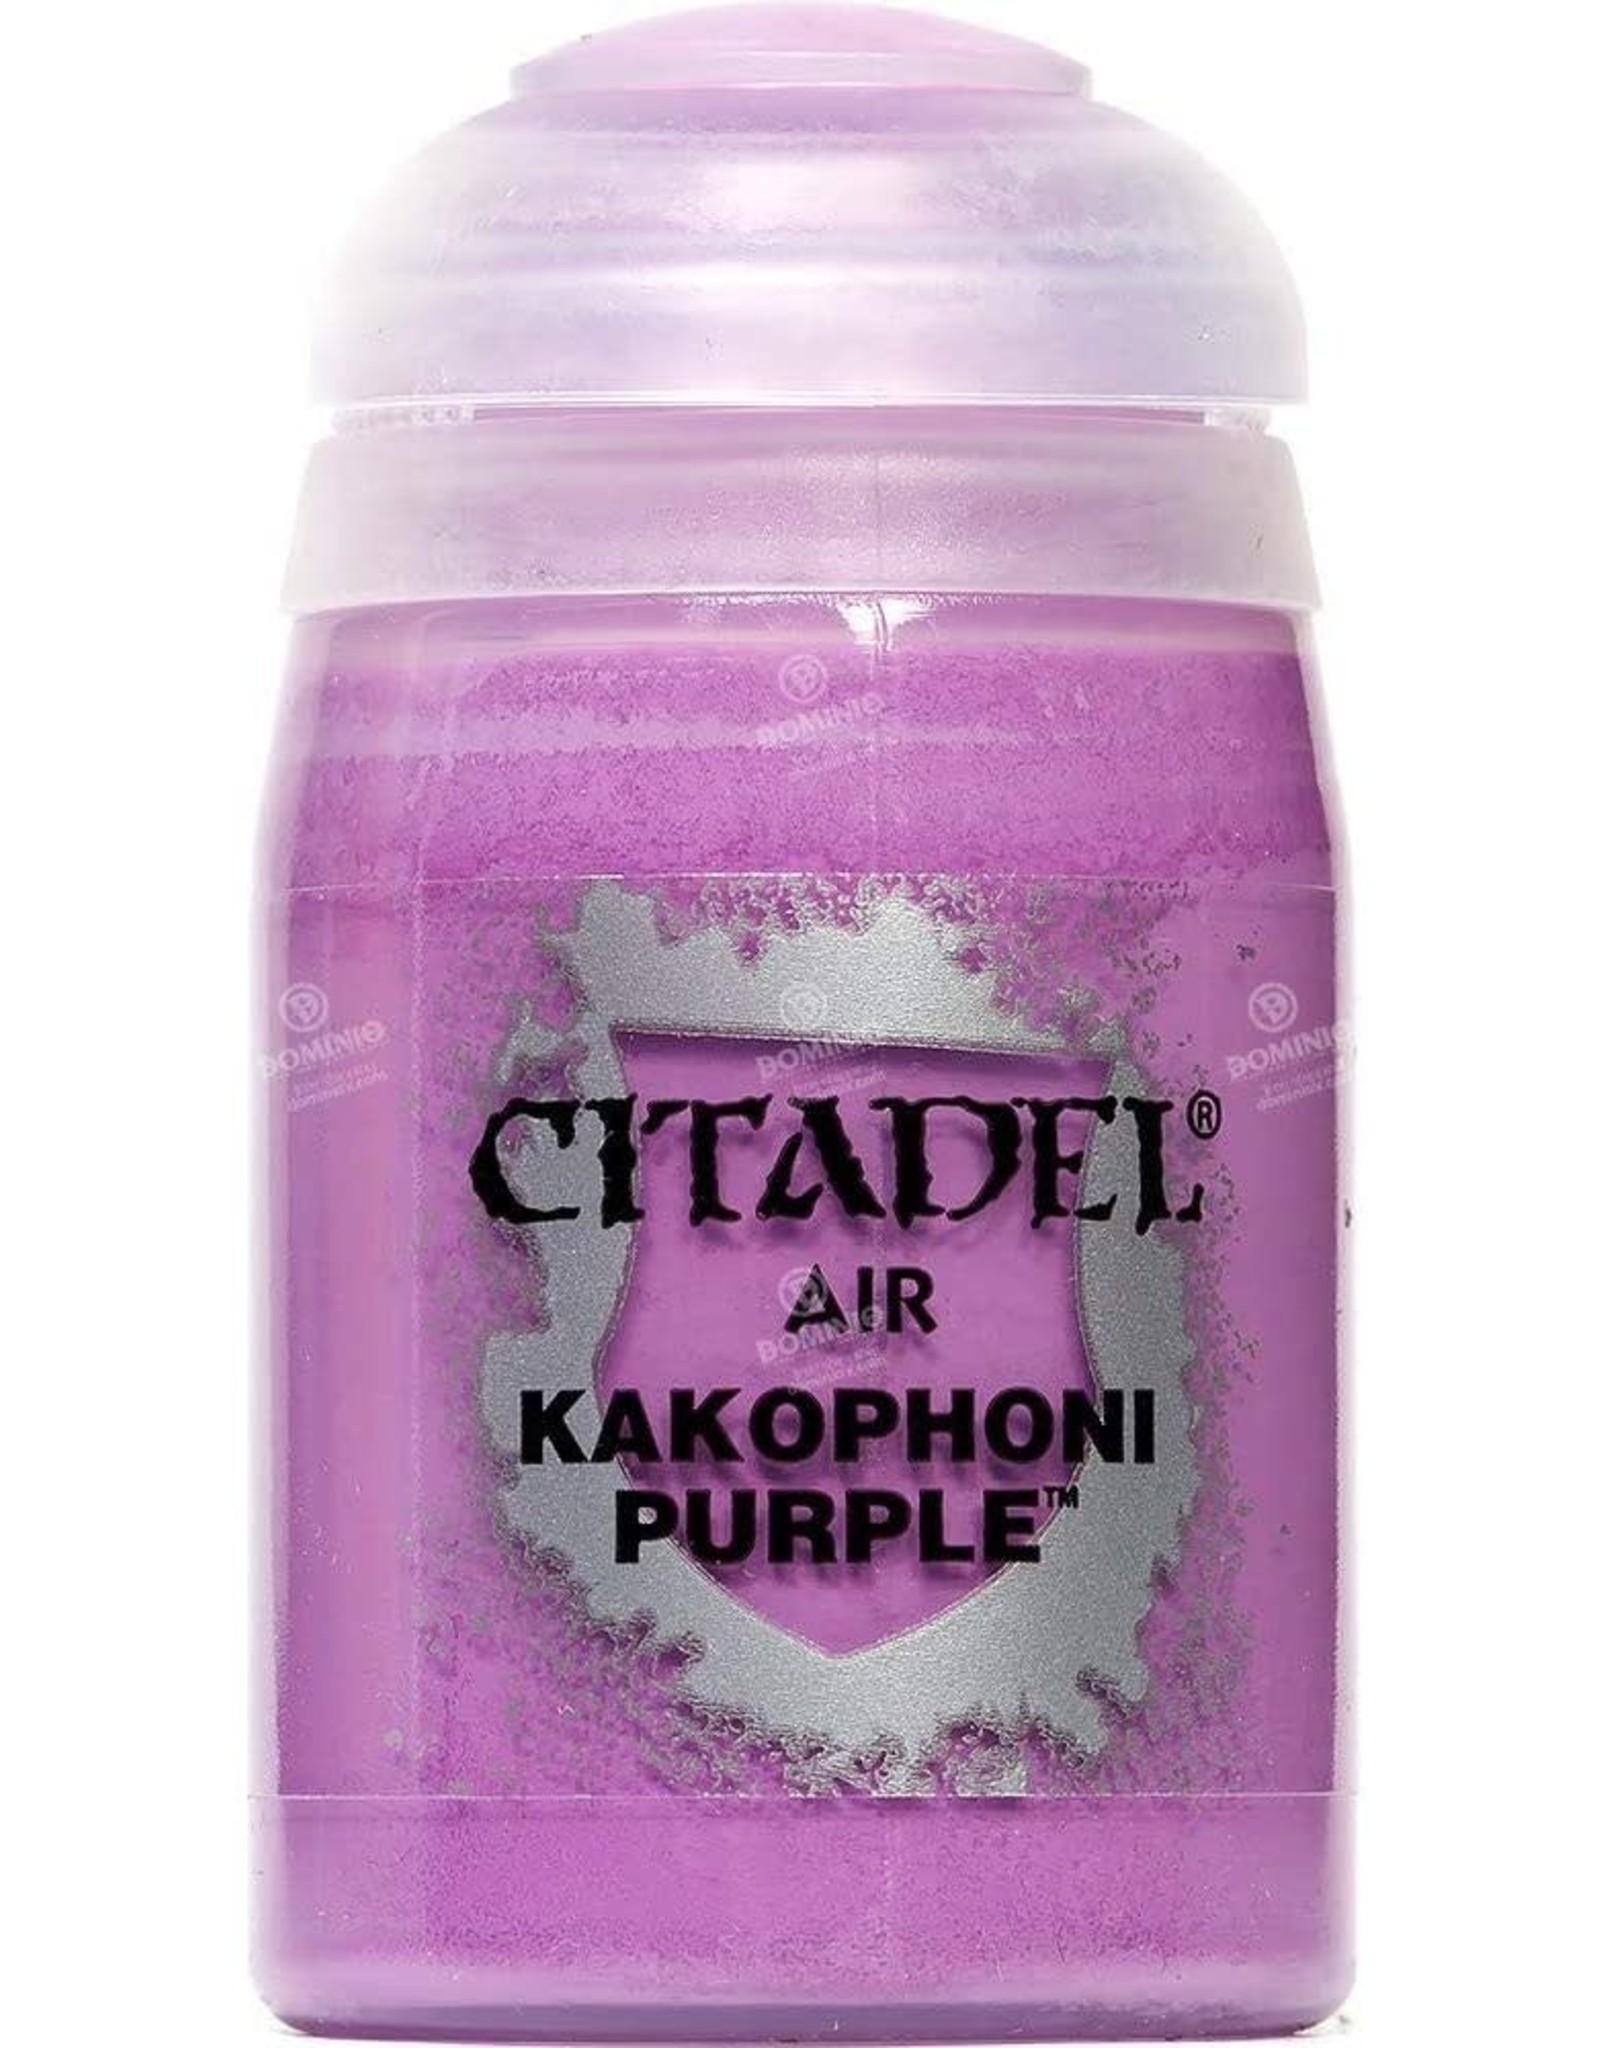 Games Workshop Citadel Paint: Kakophoni Purple Air (24 ml)